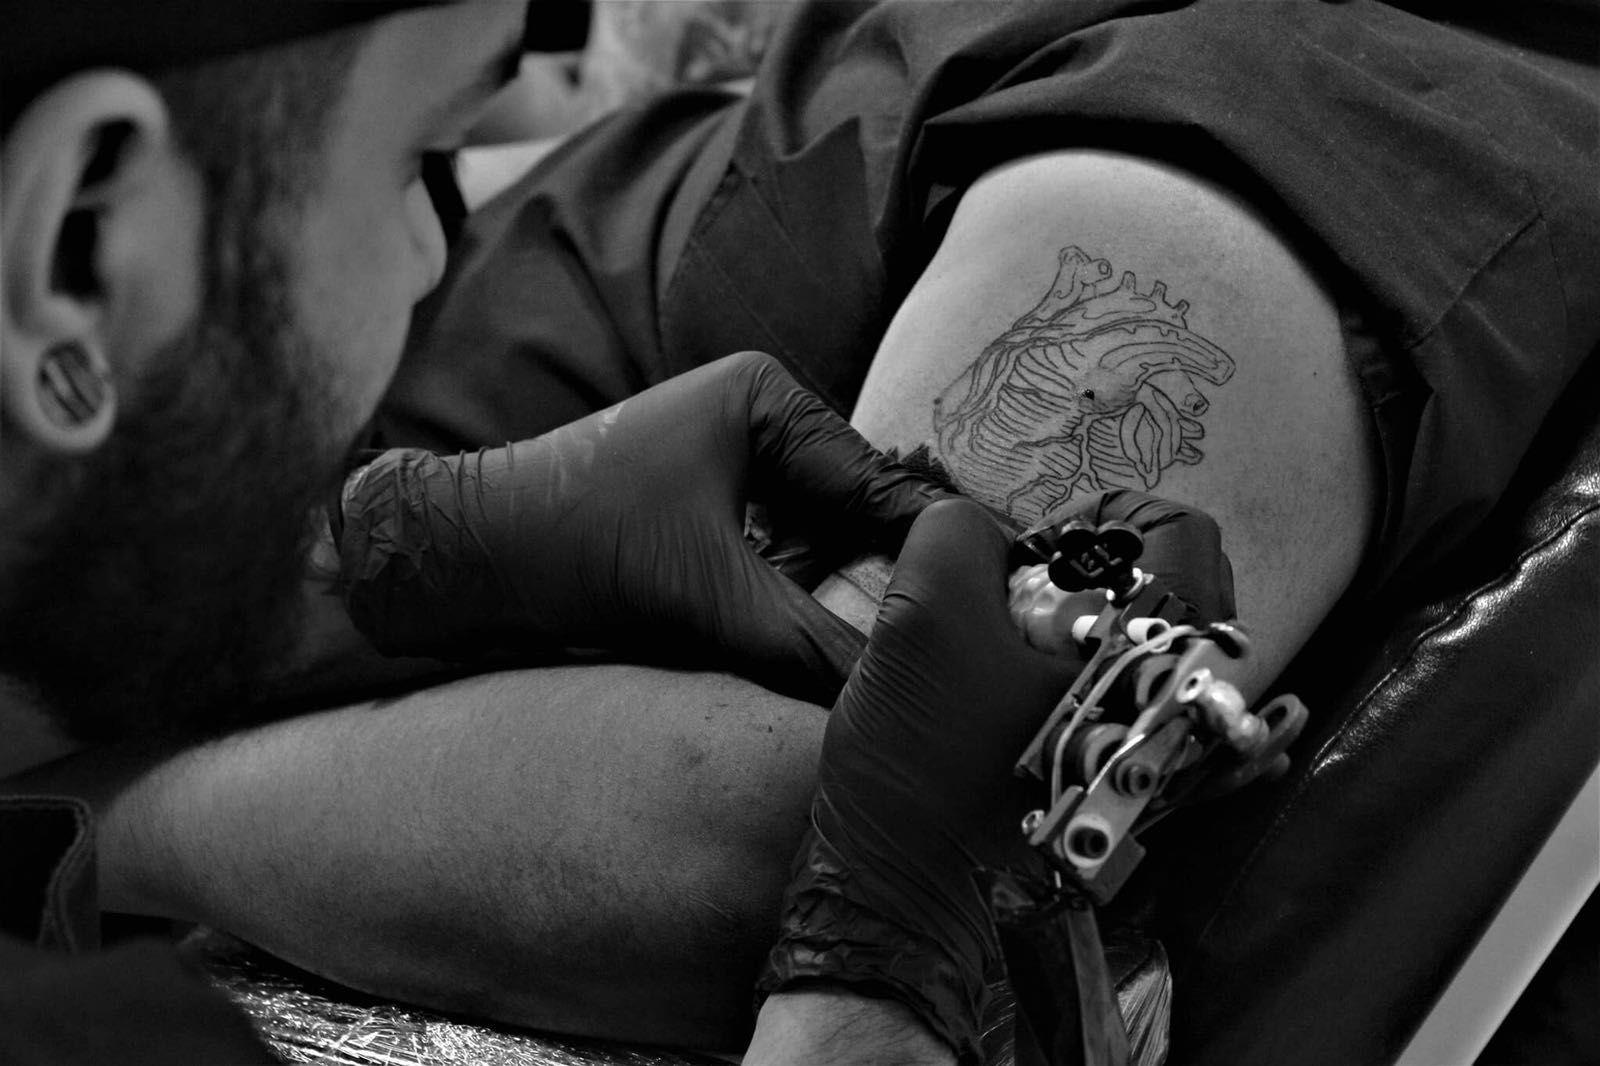 Boskn: Tattoo de Under Skin Tattoo Santa Co